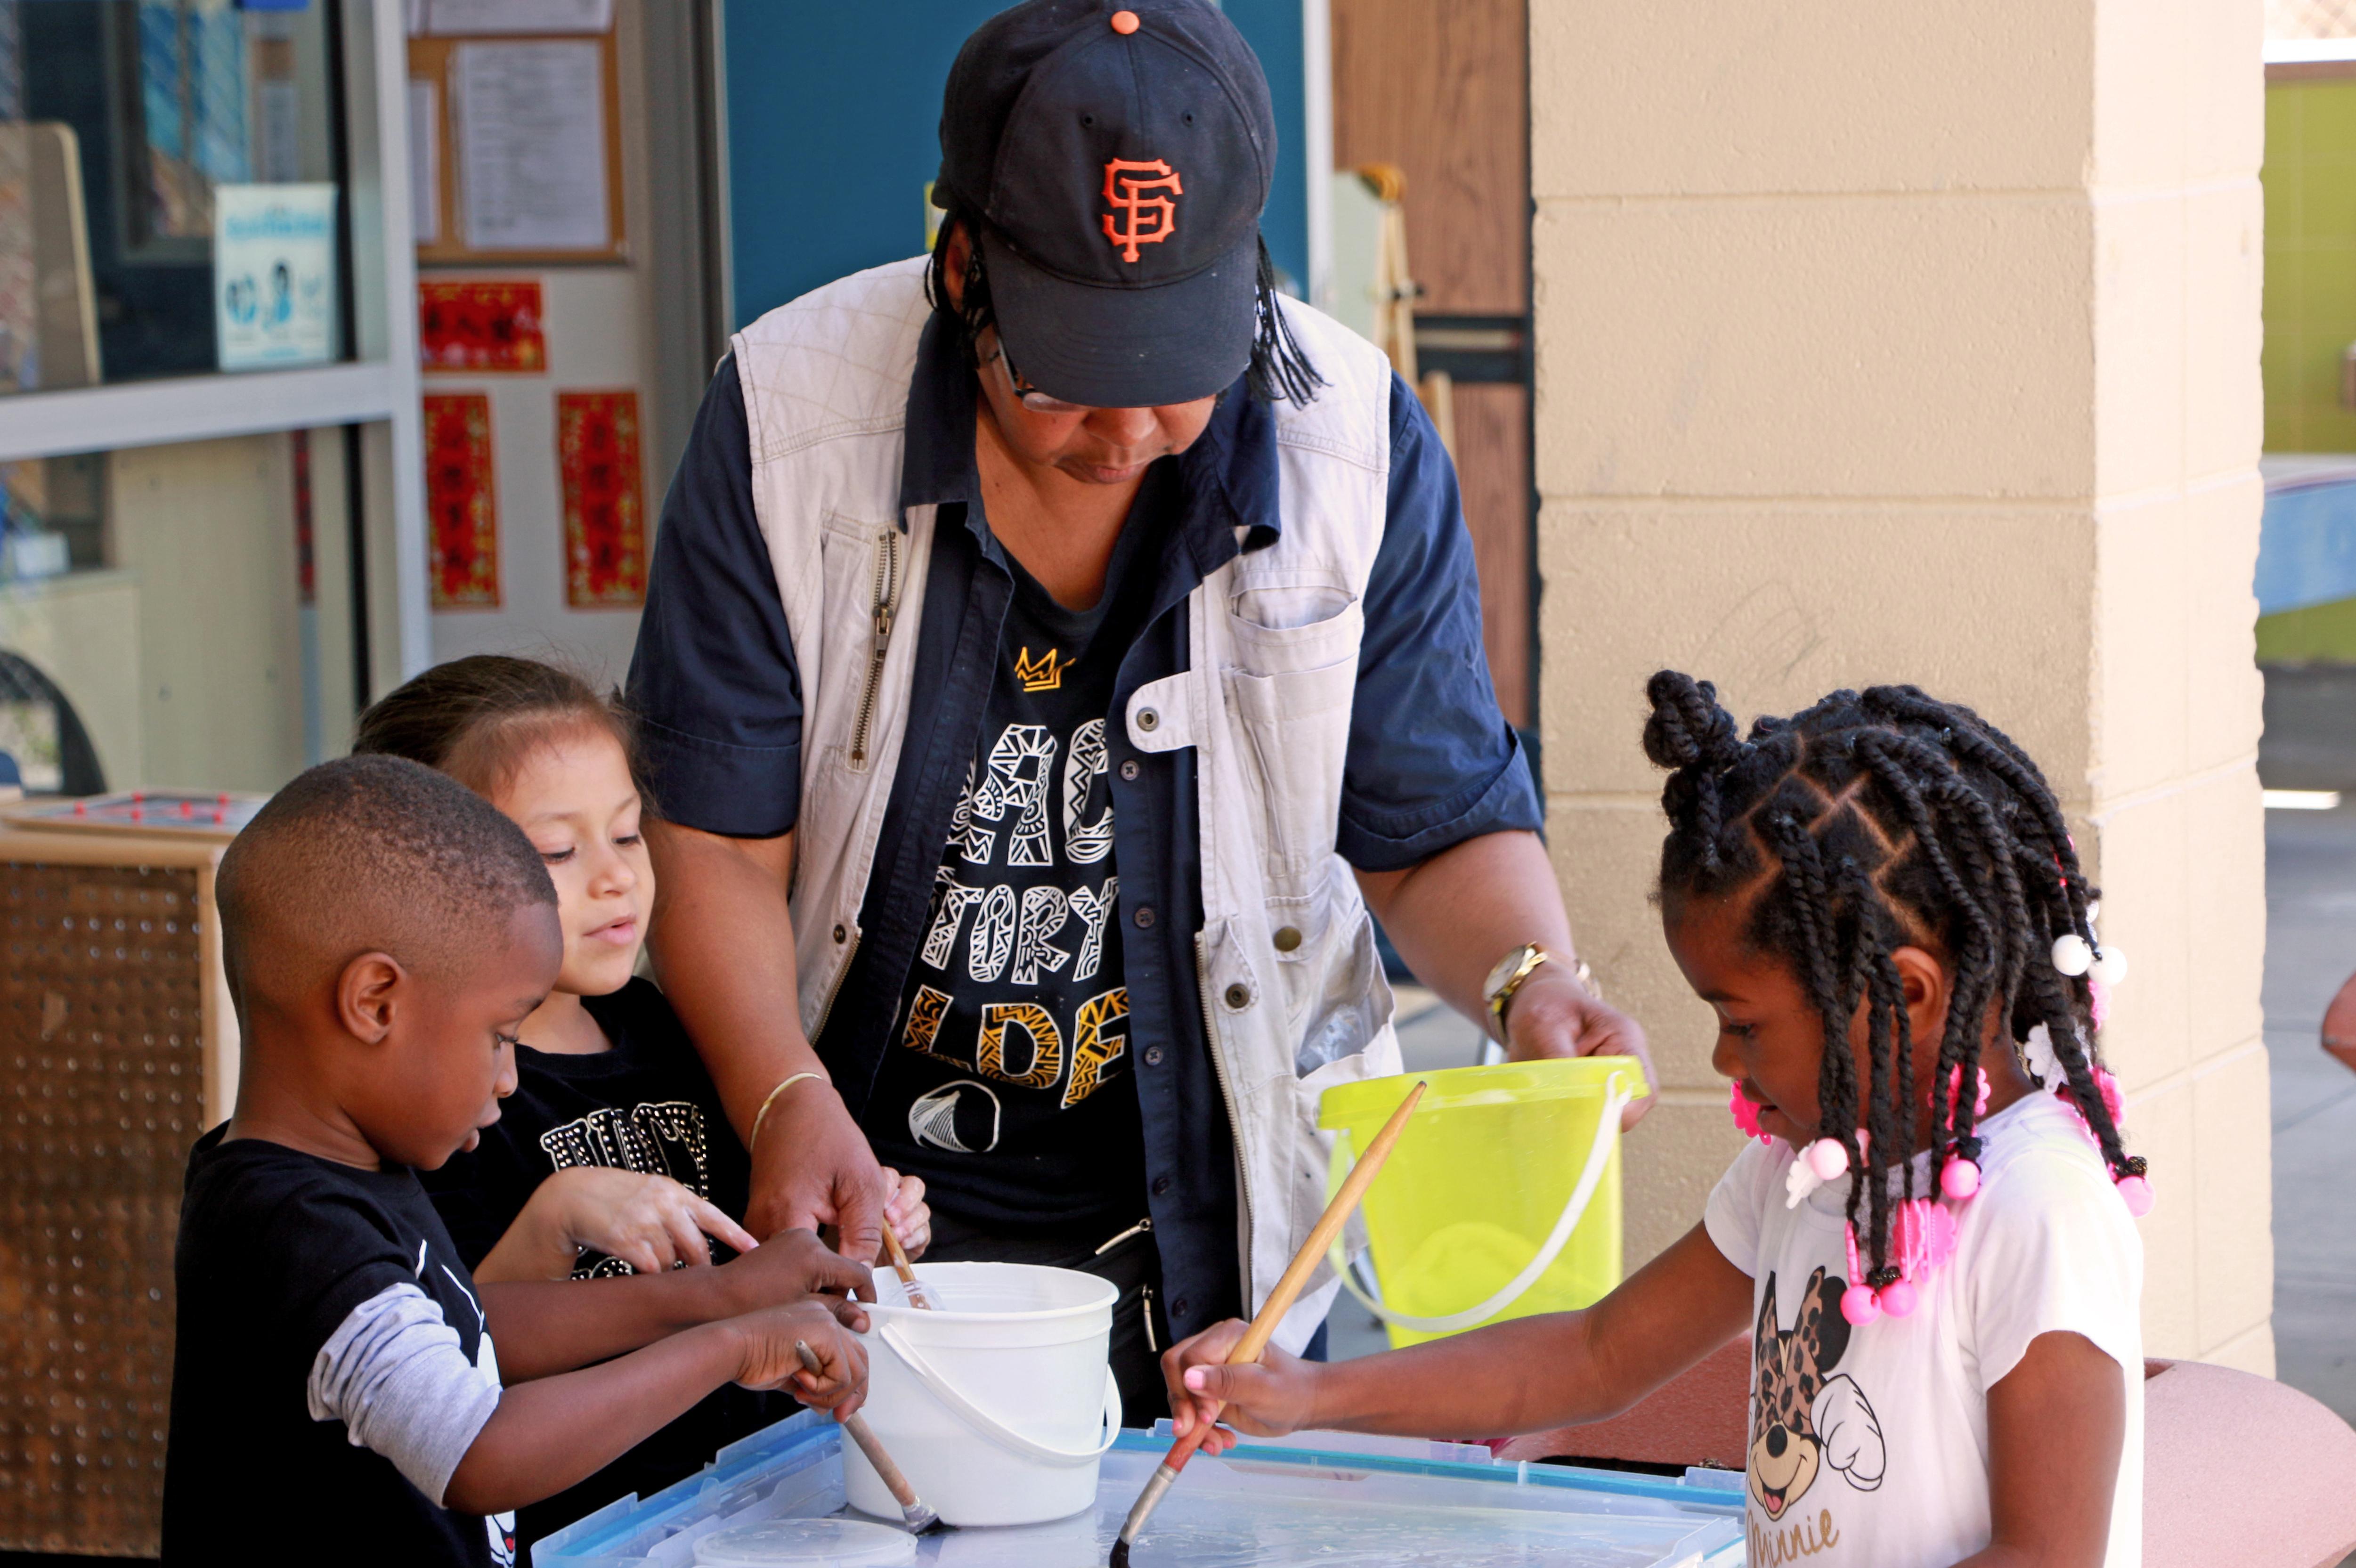 Woman helping three children paint